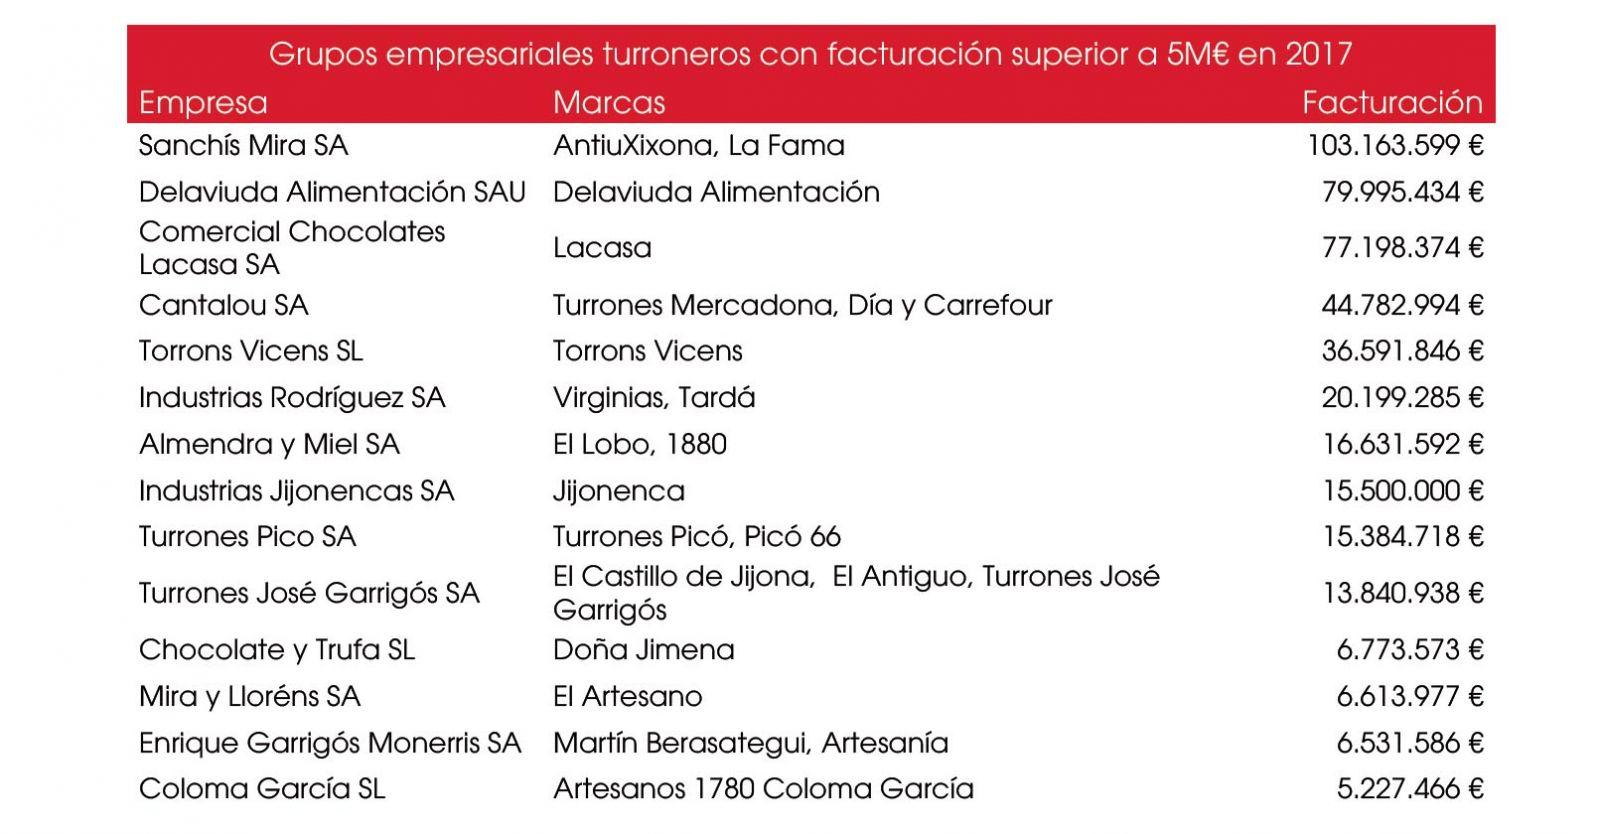 cifras de facturación principales fabricantes de turrón